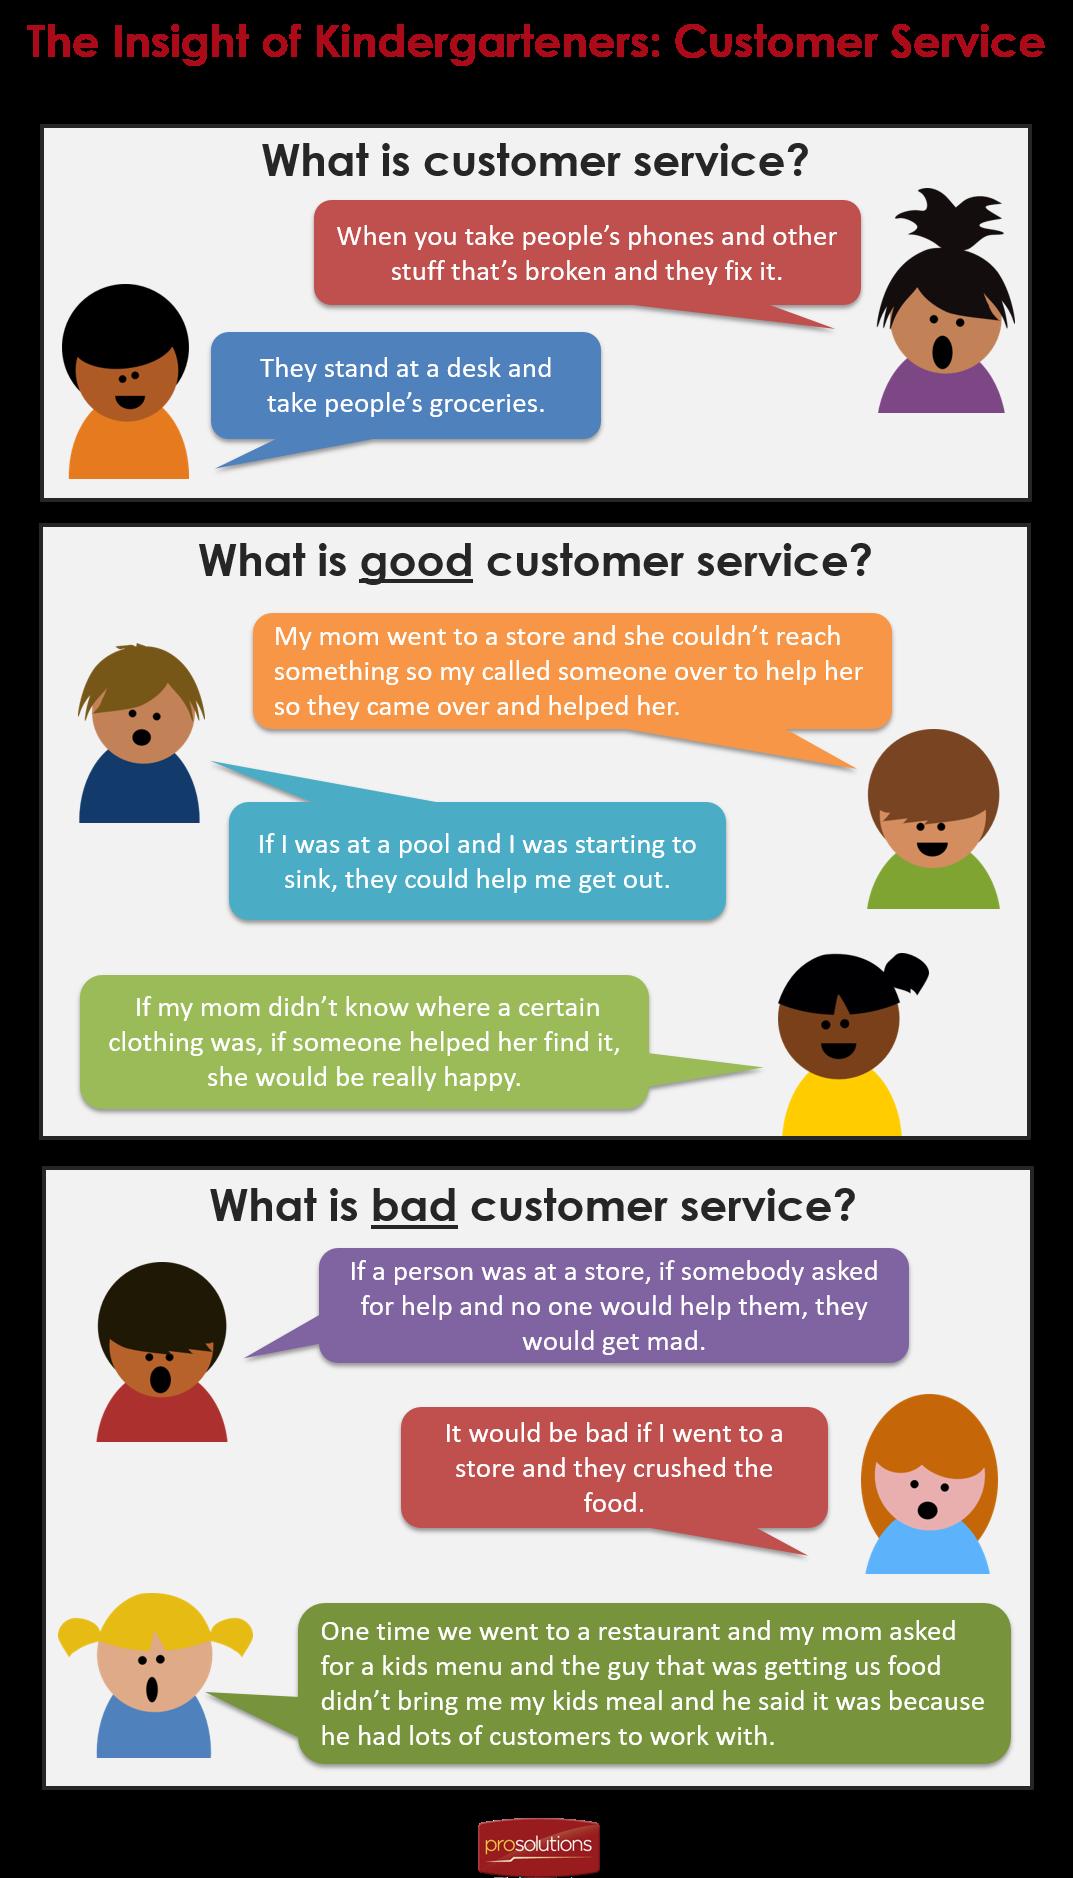 The Insights of Kindergartners: Customer Service